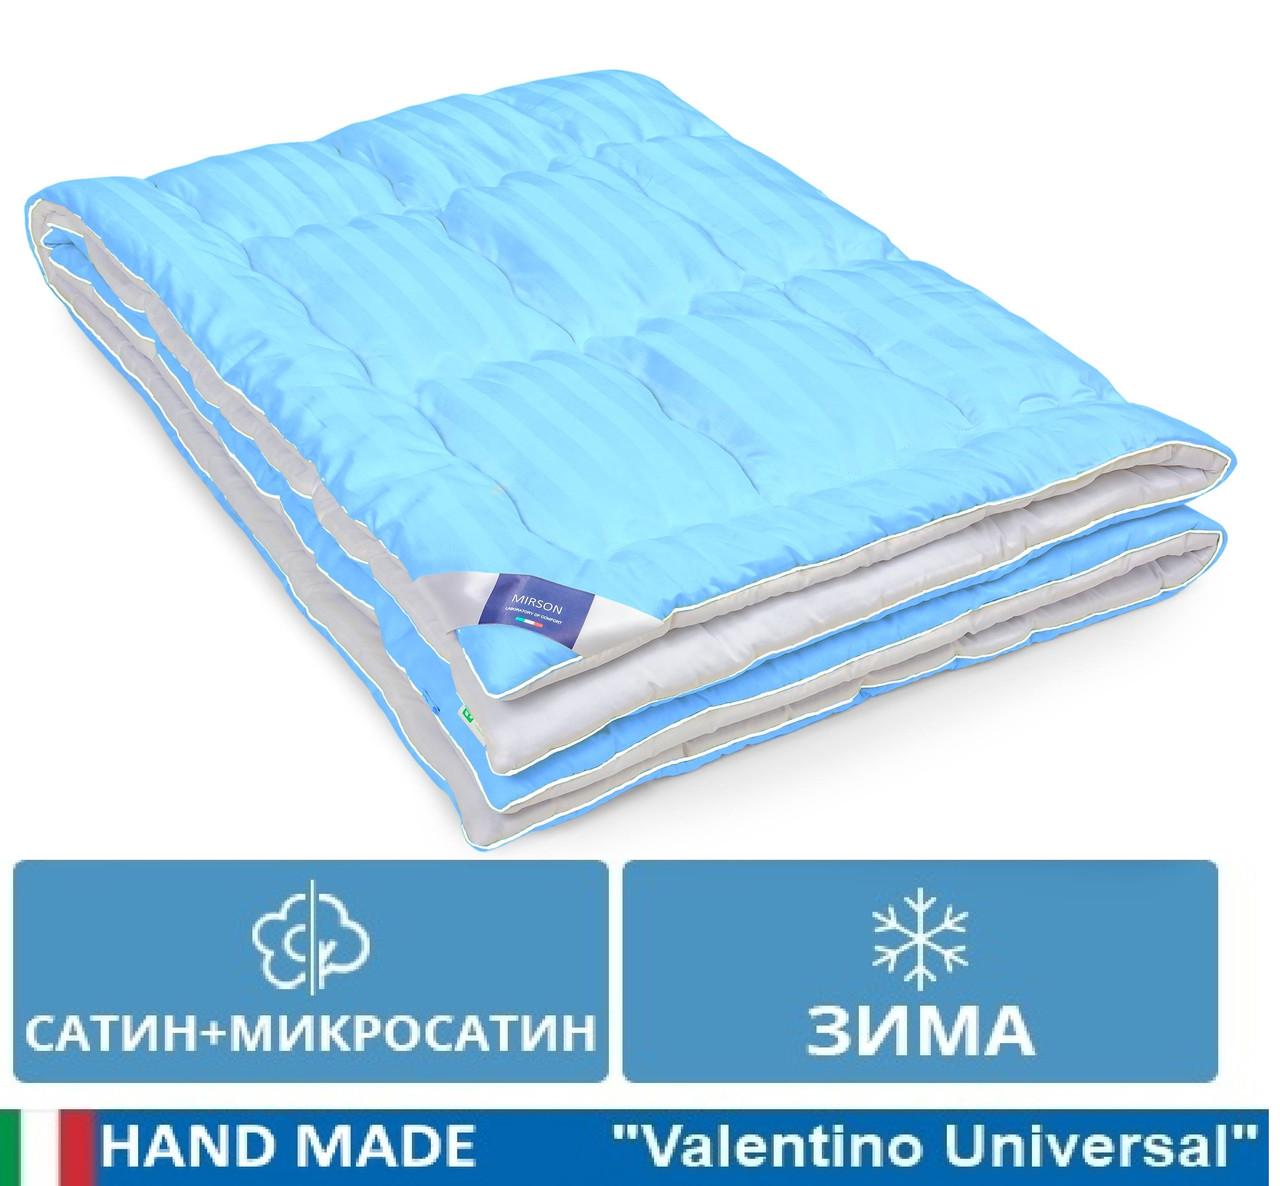 Одеяло полуторное Зимнее 140x205 Valentino HAND MADE EcoSilk  0554